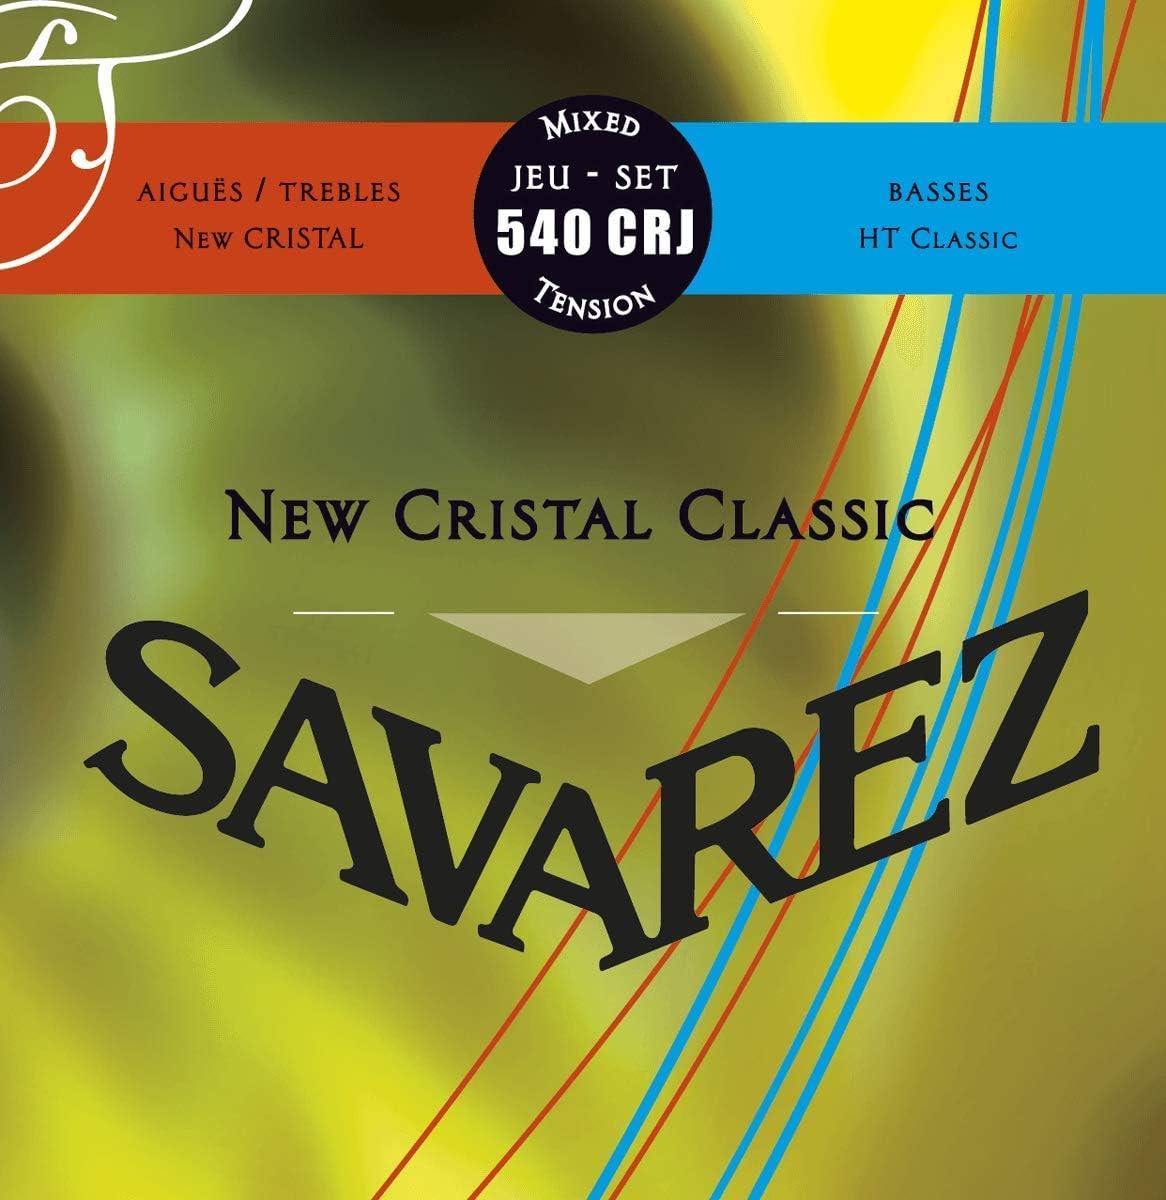 Savarez 656177 - Cuerdas para Guitarra Clásica New Cristal Classic juego 540CRJ Tensión mezclada, rojo, azul